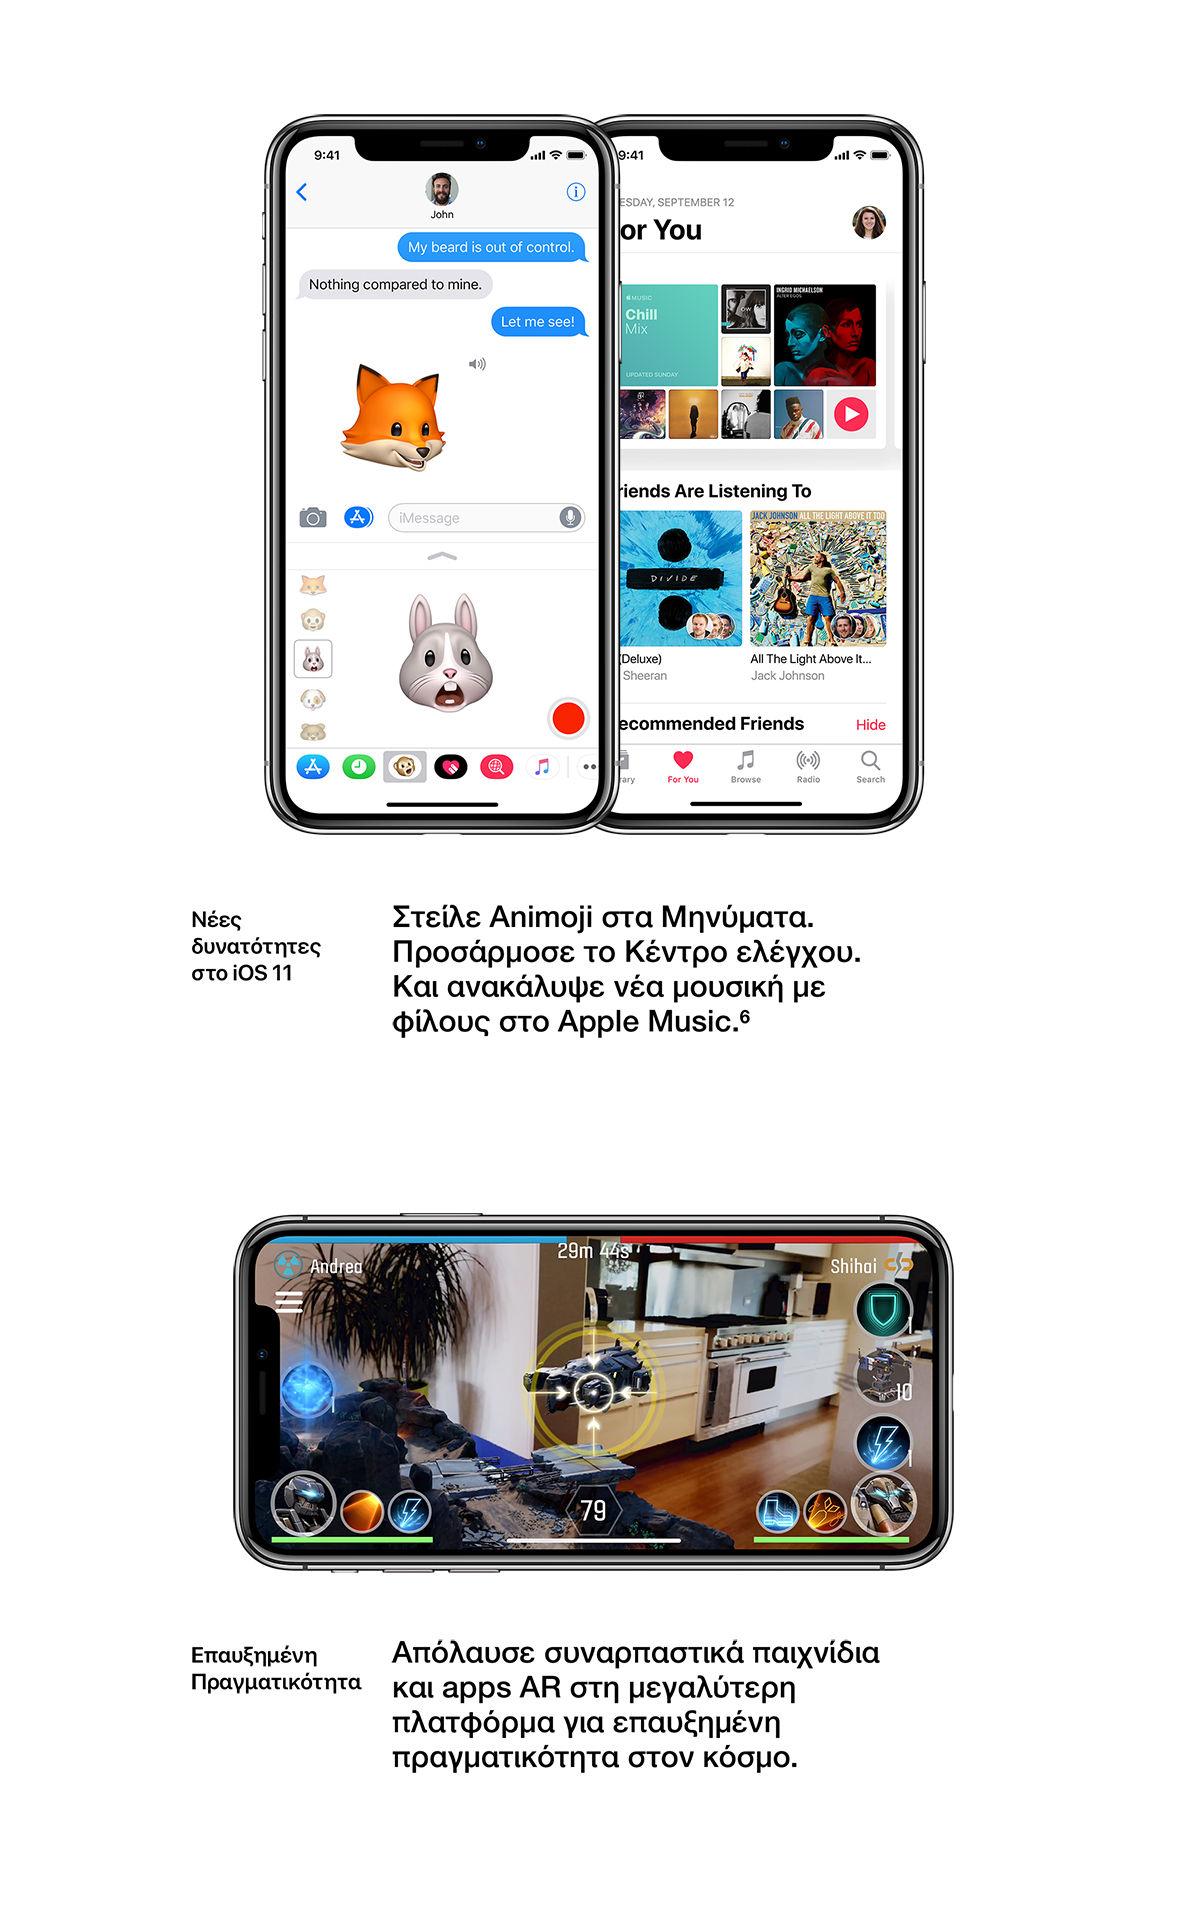 iPhonex-agora-Ellada-Mediamarkt-public-kotsovolos-germanos-iPhoneX-diathesimo-gia-paraggelia-november-2017 (15)